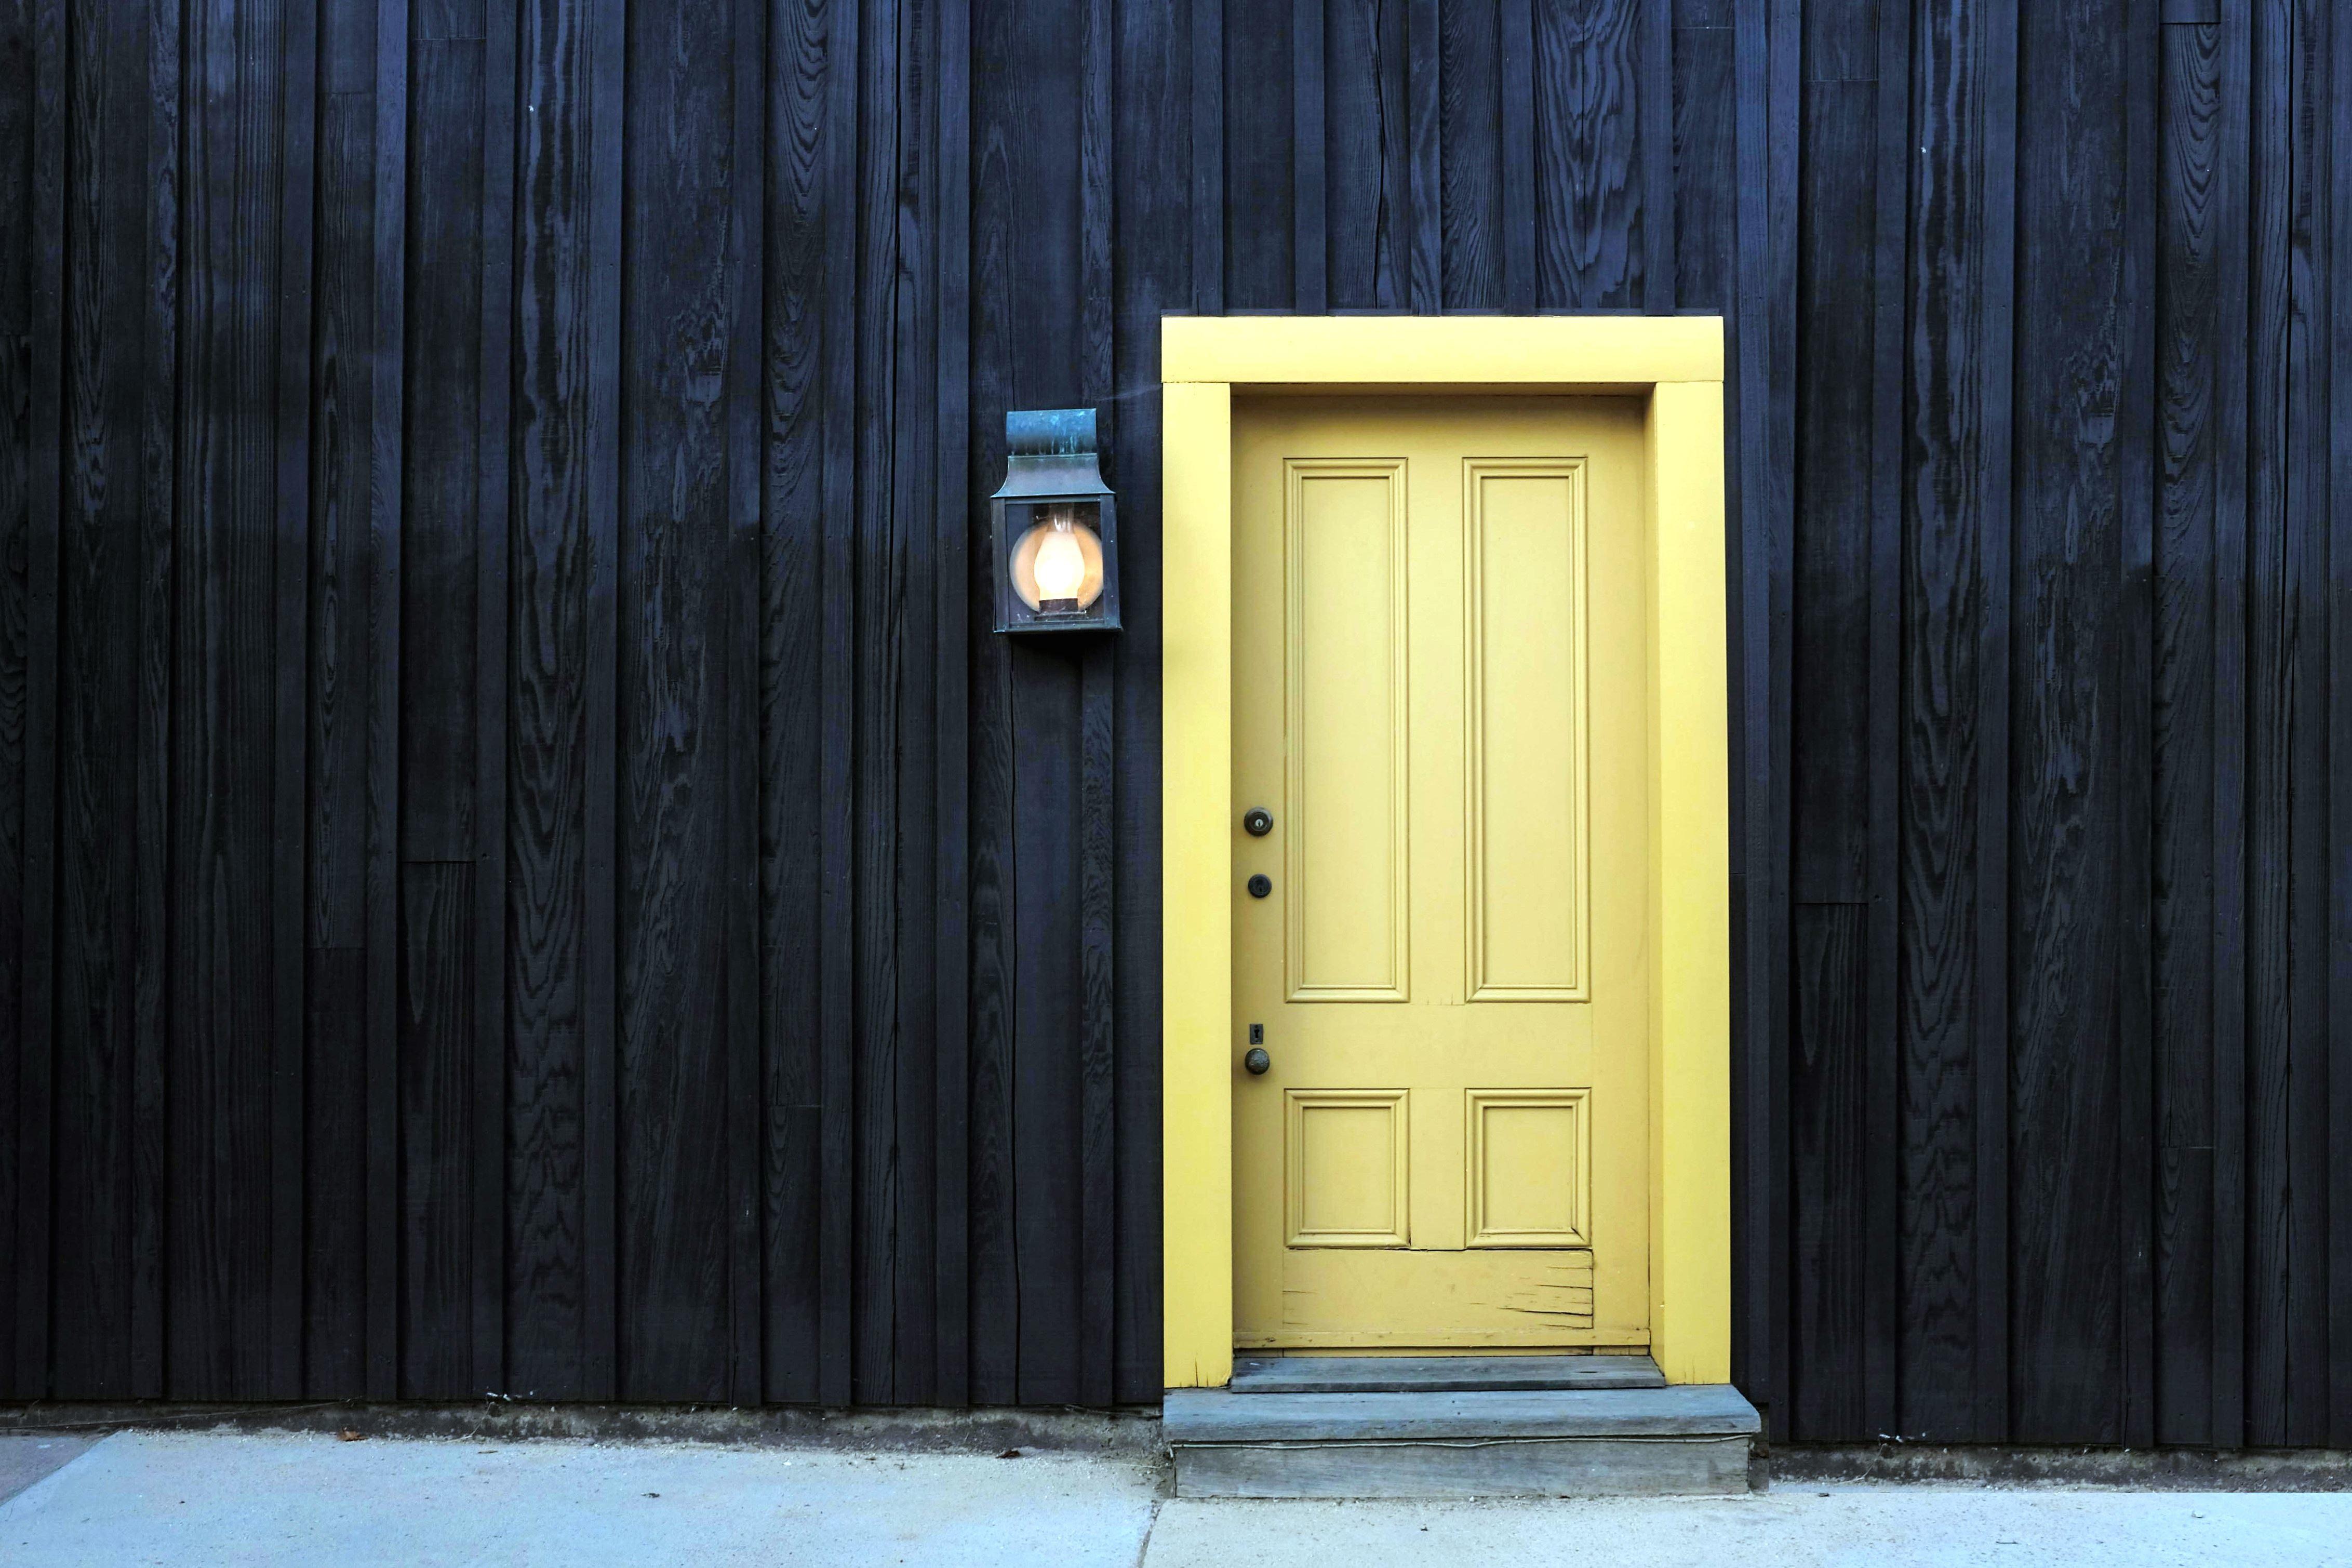 Imagen gratis casa de madera puerta de entrada lmpara